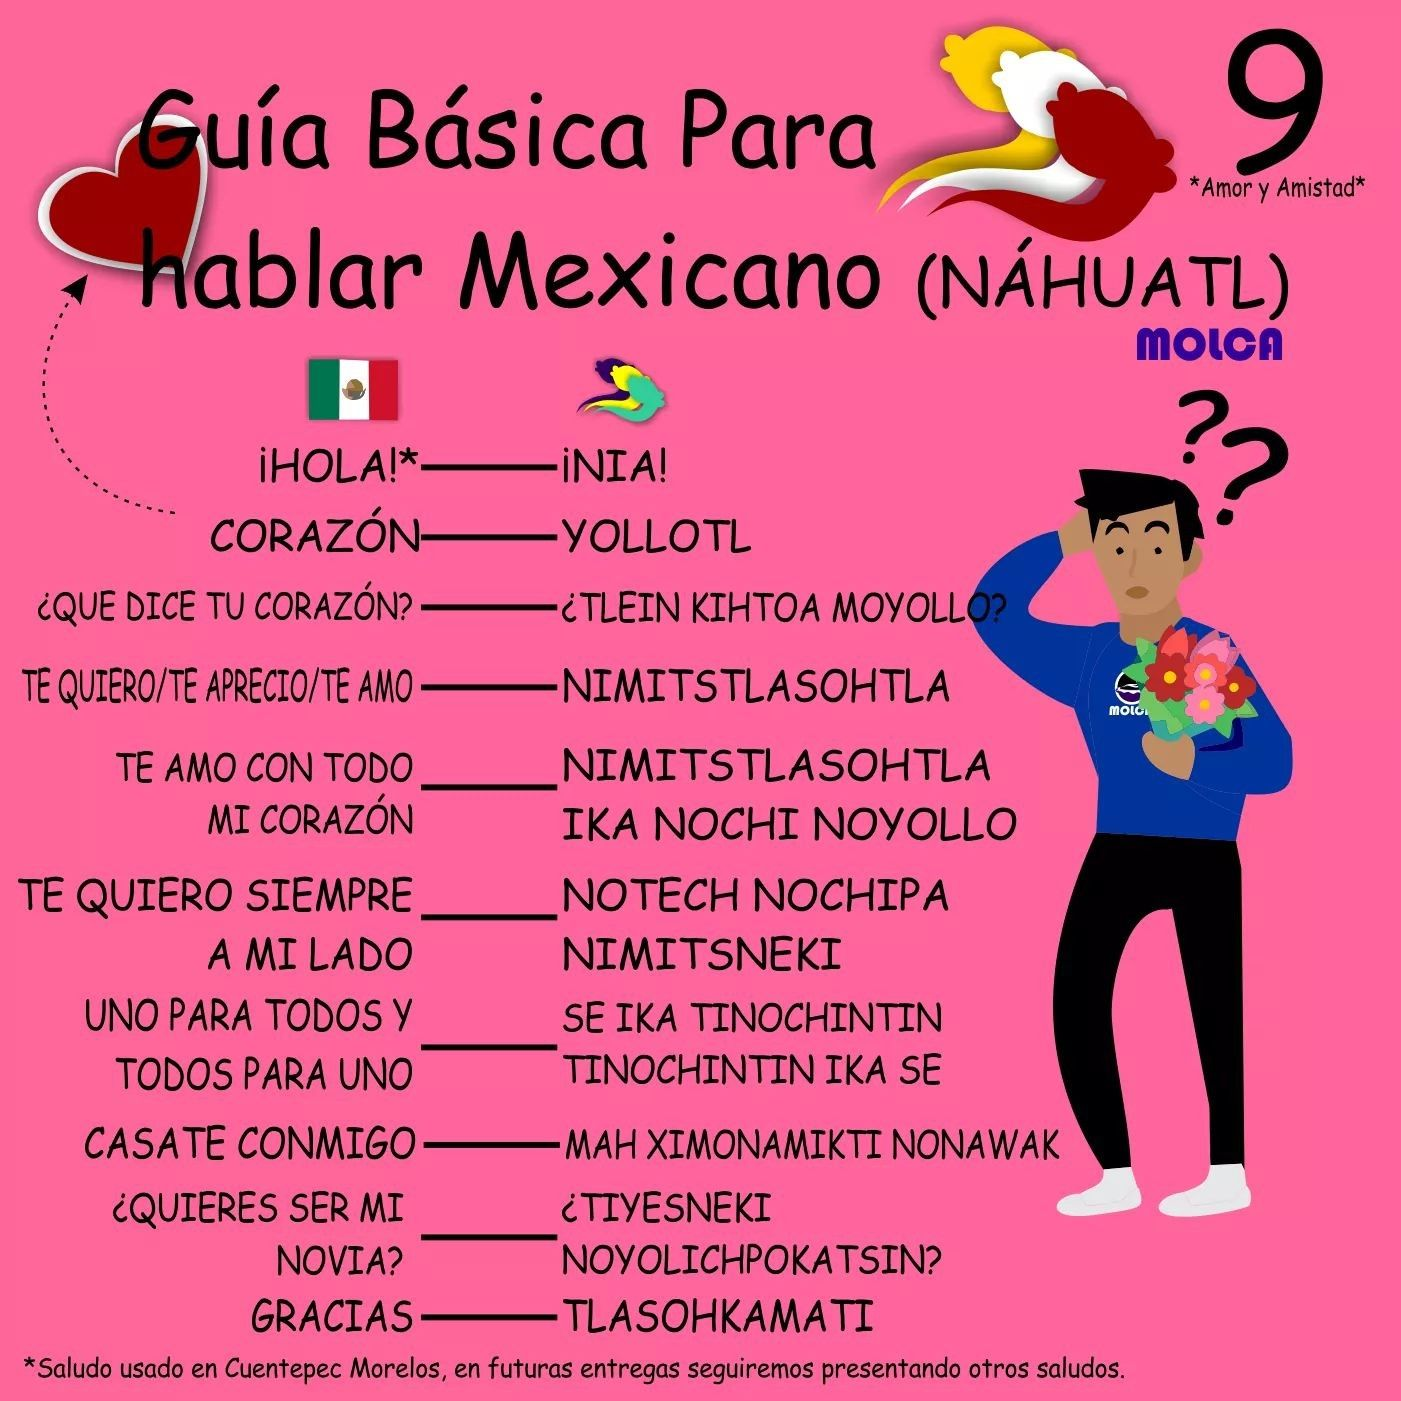 Pin De Vatazslav Vaculak En Nahuatl Cualli Ihuan Quemaaaaaah Palabras En Nahuatl Lenguas Indigenas De Mexico Frases De Cultura